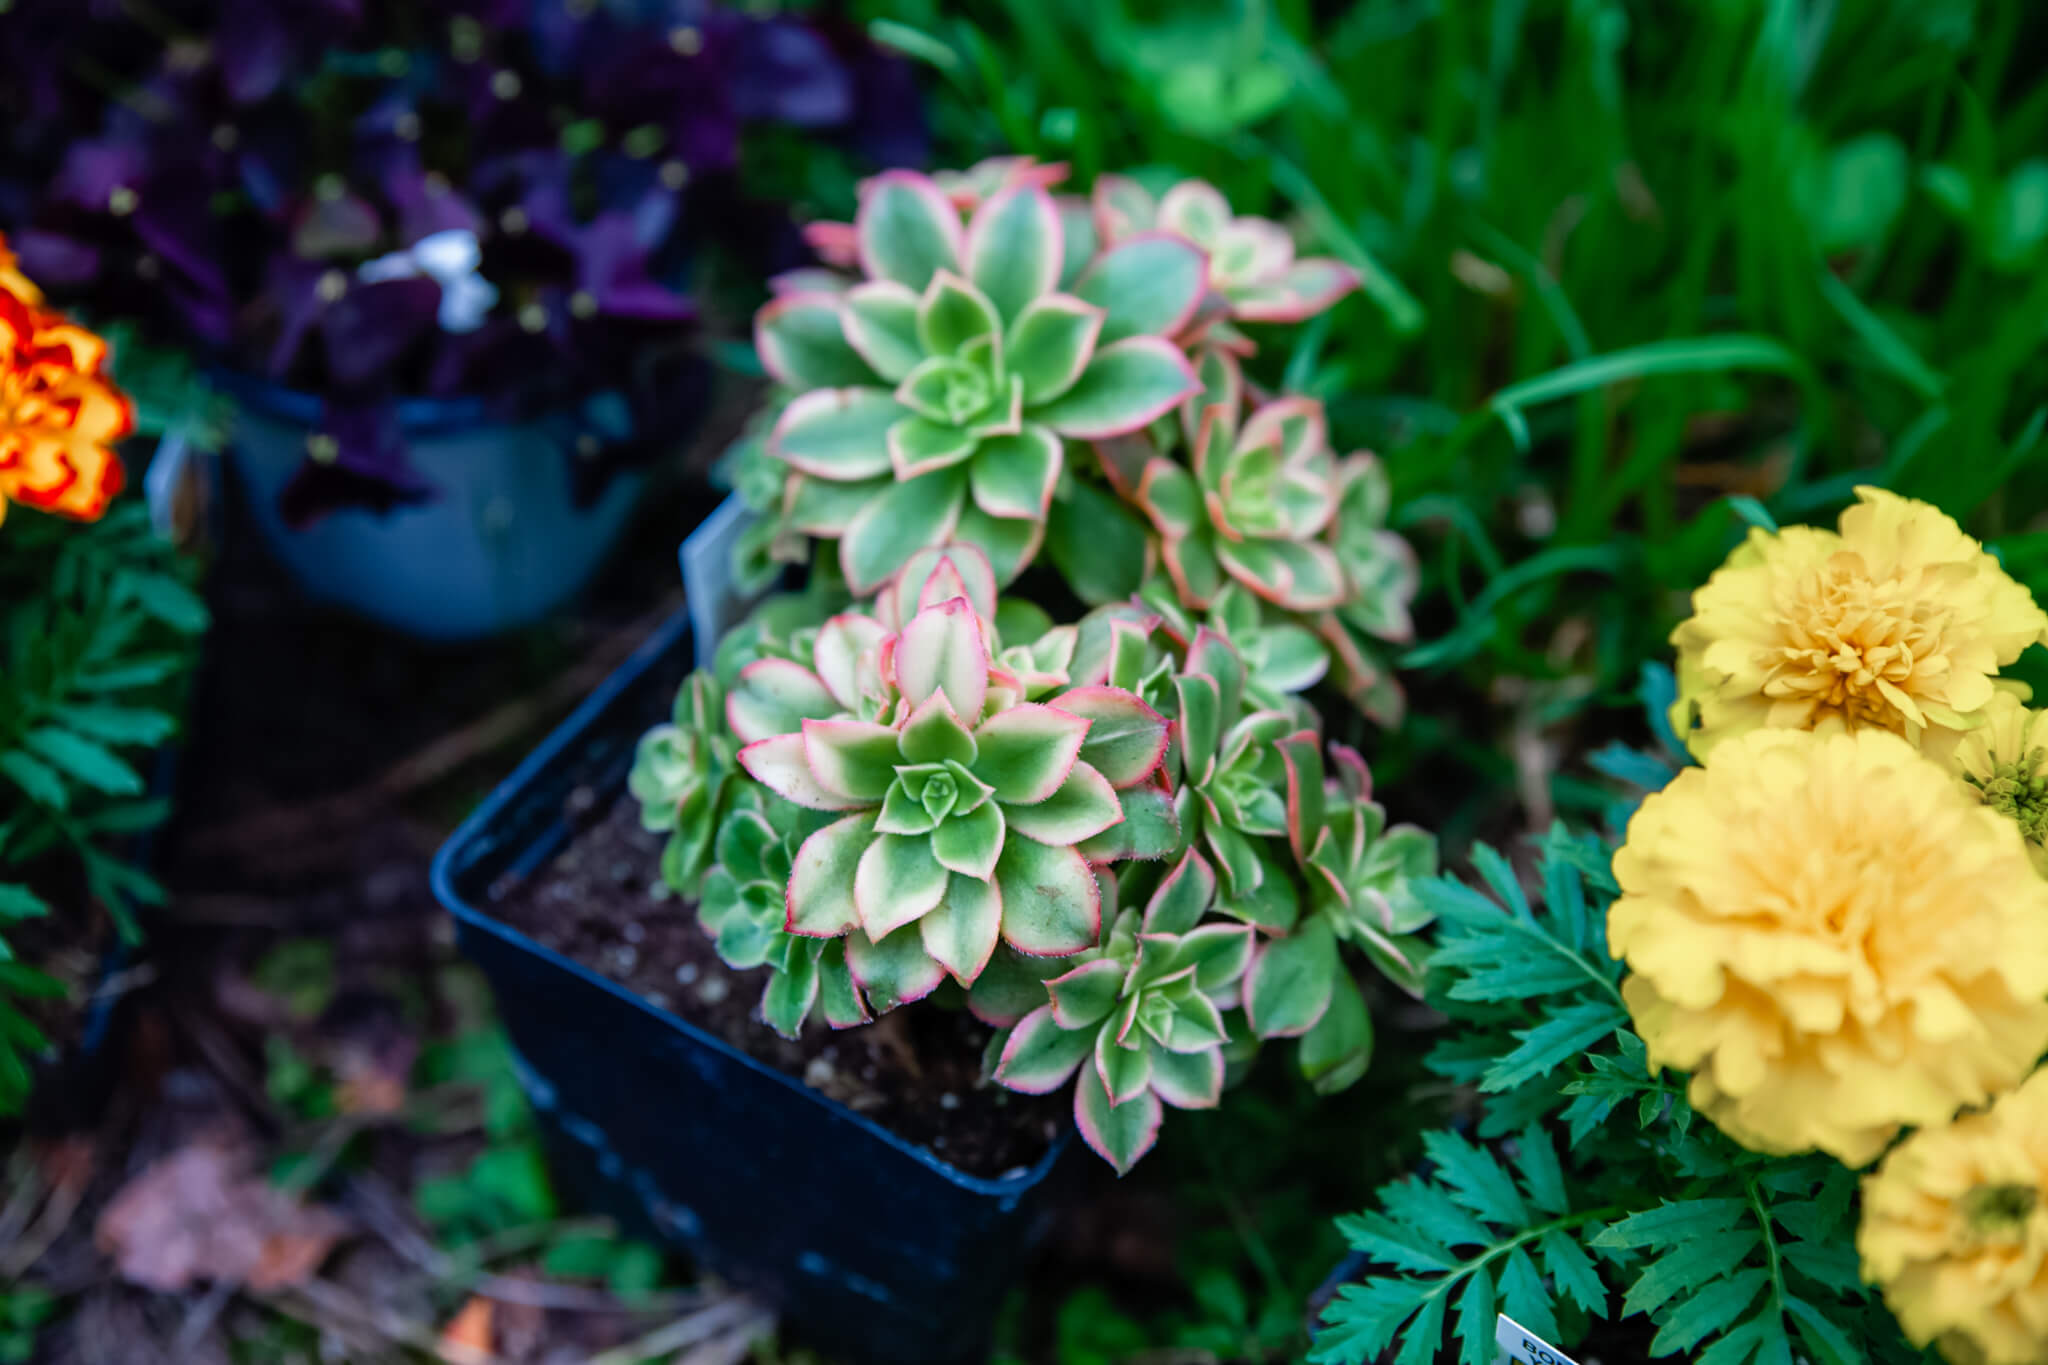 A vibrant, pink-trimmed succulent.